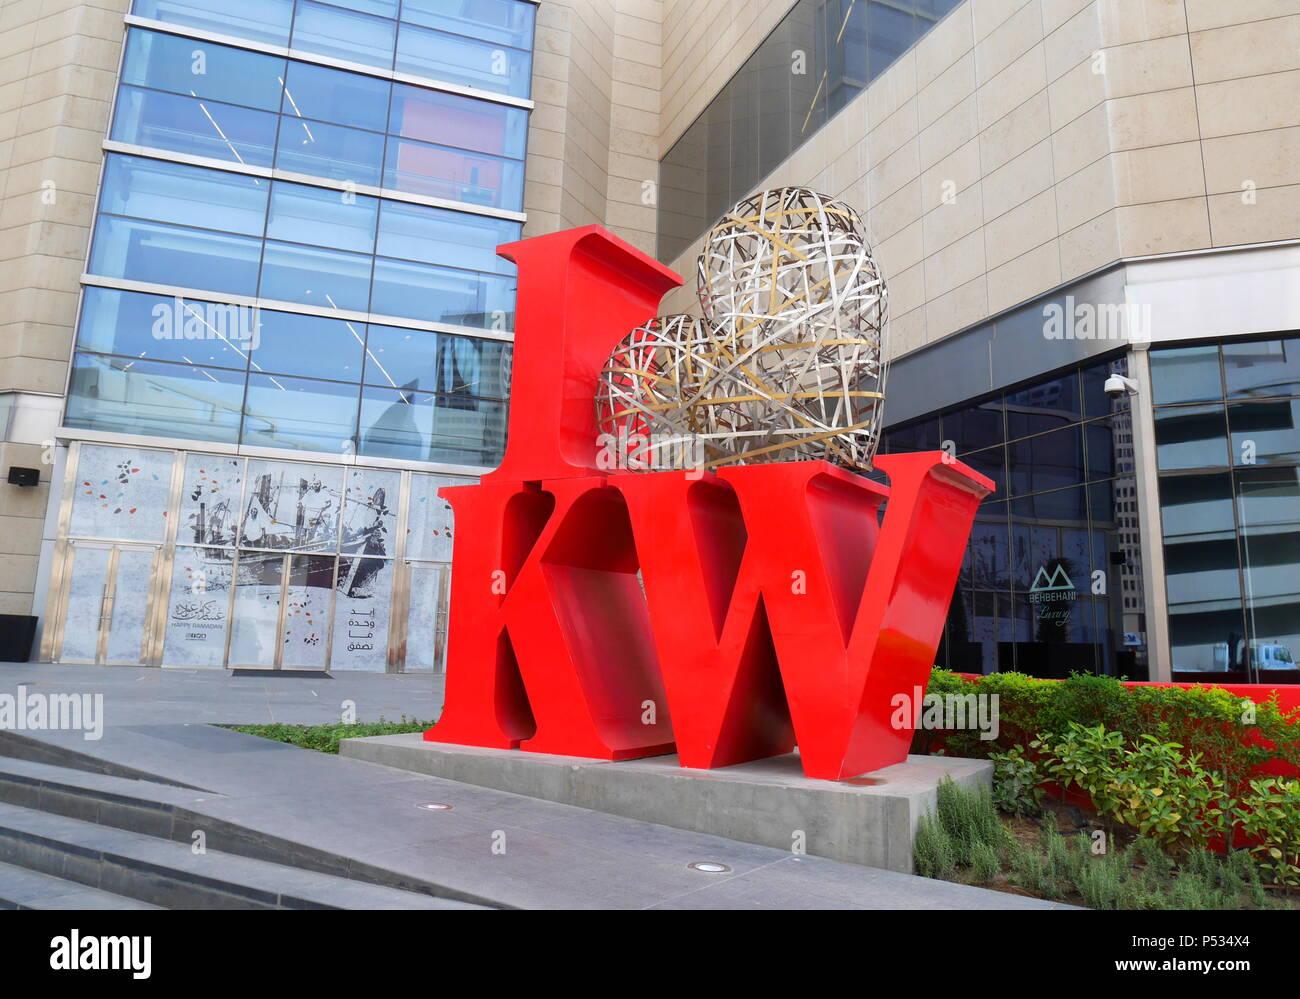 I Love Kuwait sign outside Al Hamra Mall, Kuwait City, Kuwait, Arabian Gulf, Middle East - Stock Image